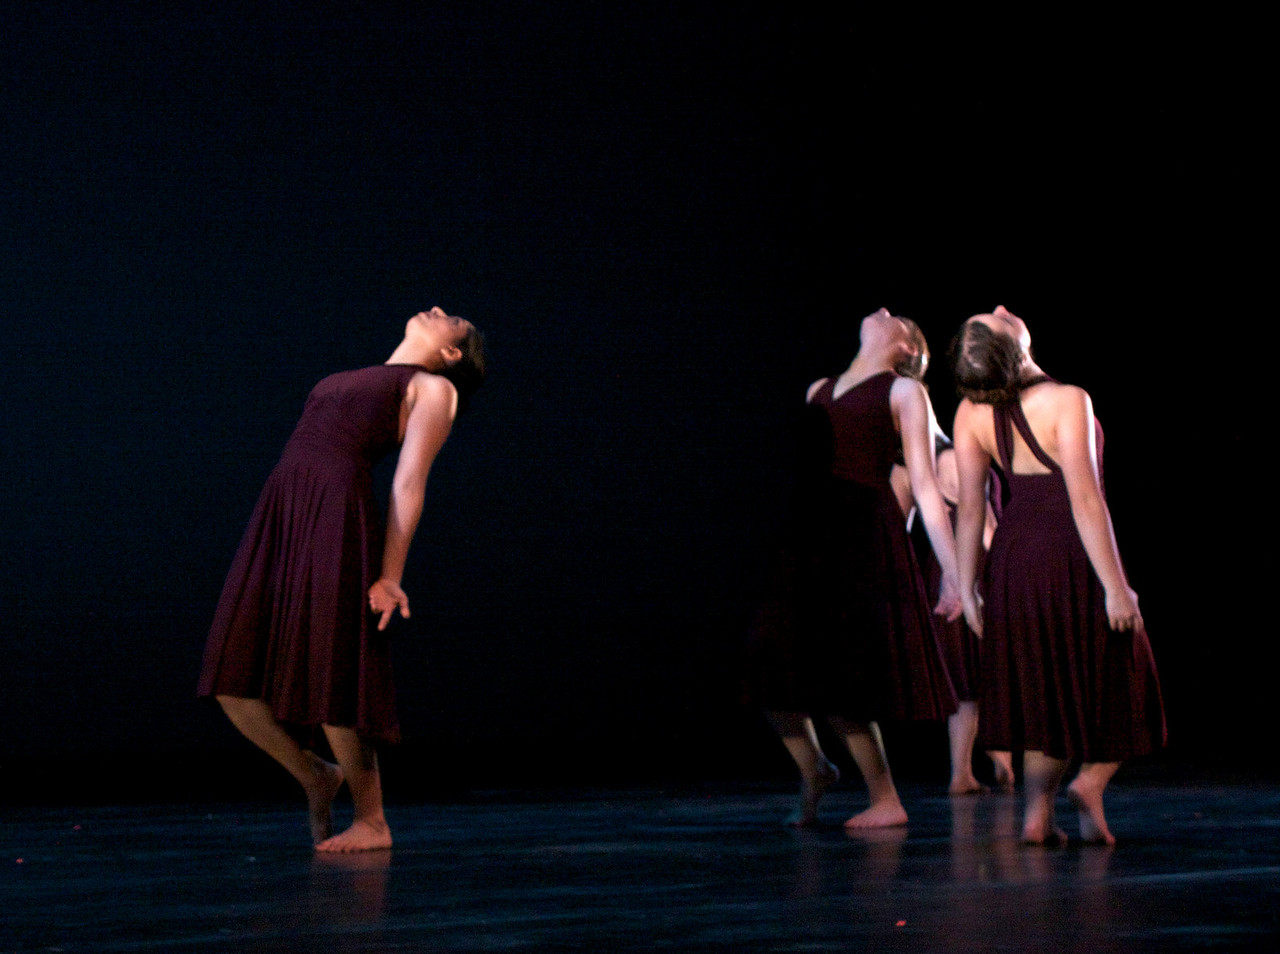 Dance wkshp -troupe 320100121_0090